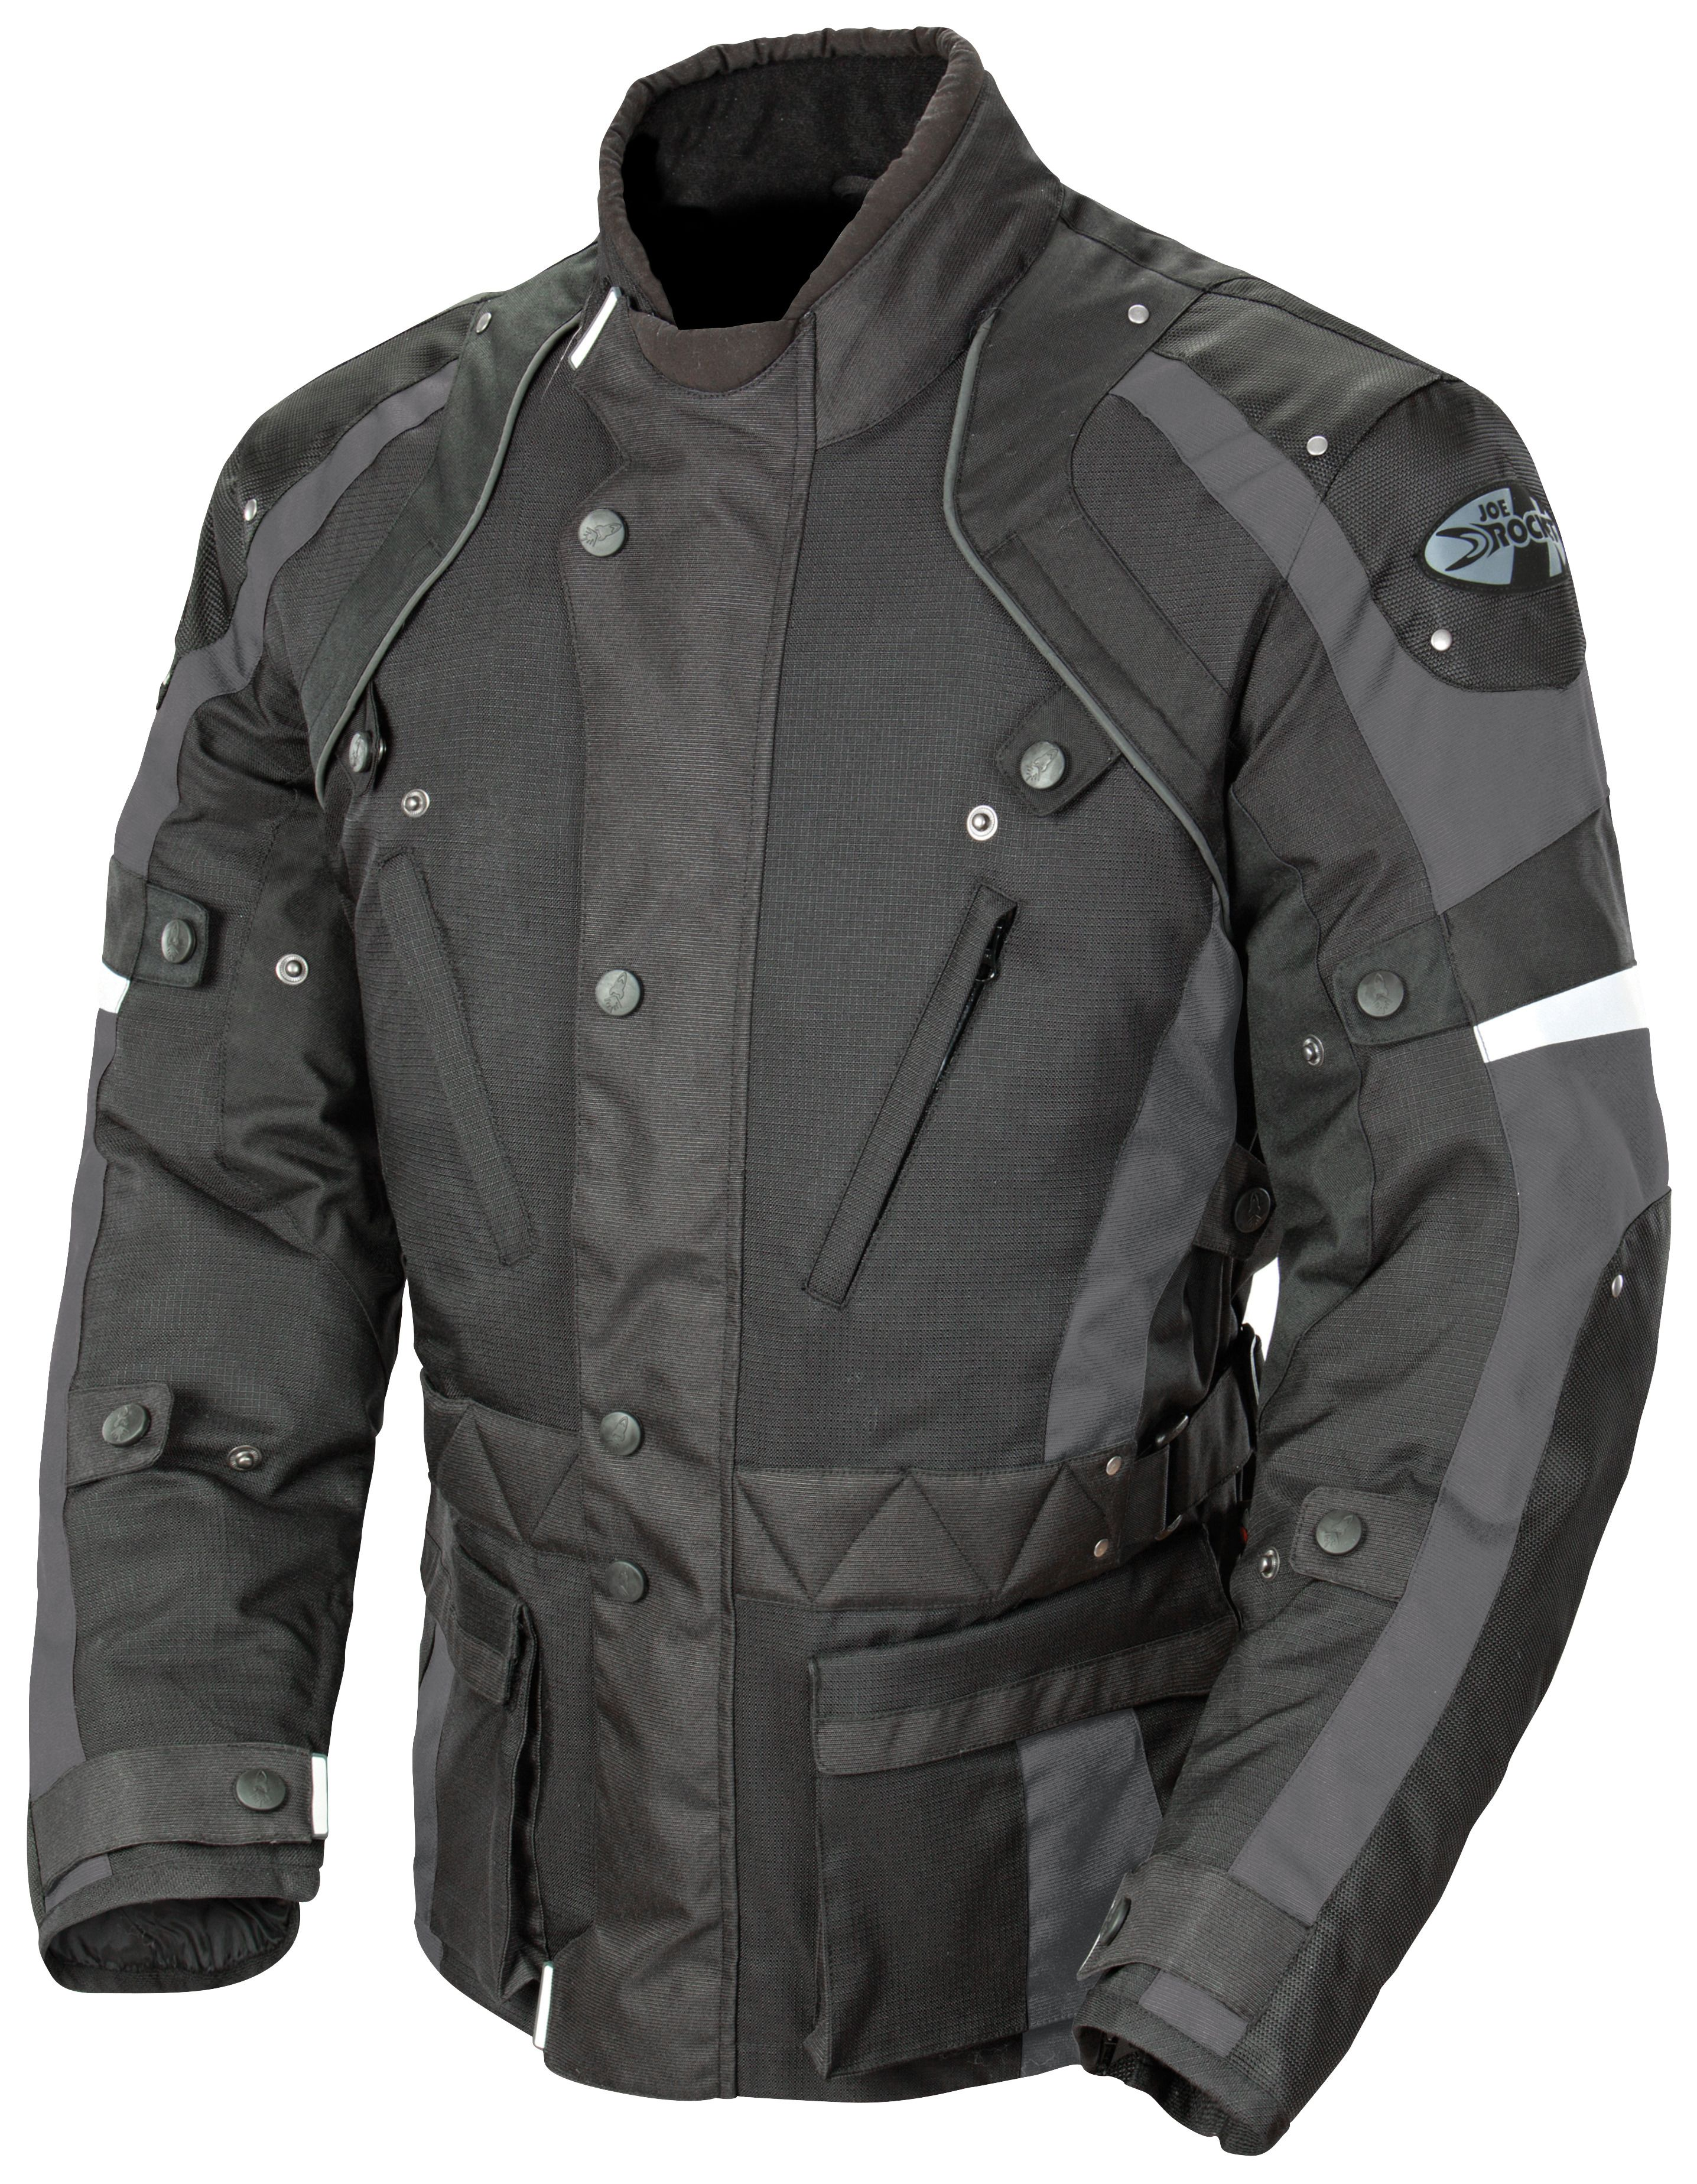 4462bae2dc7 Joe Rocket Ballistic Revolution Jacket